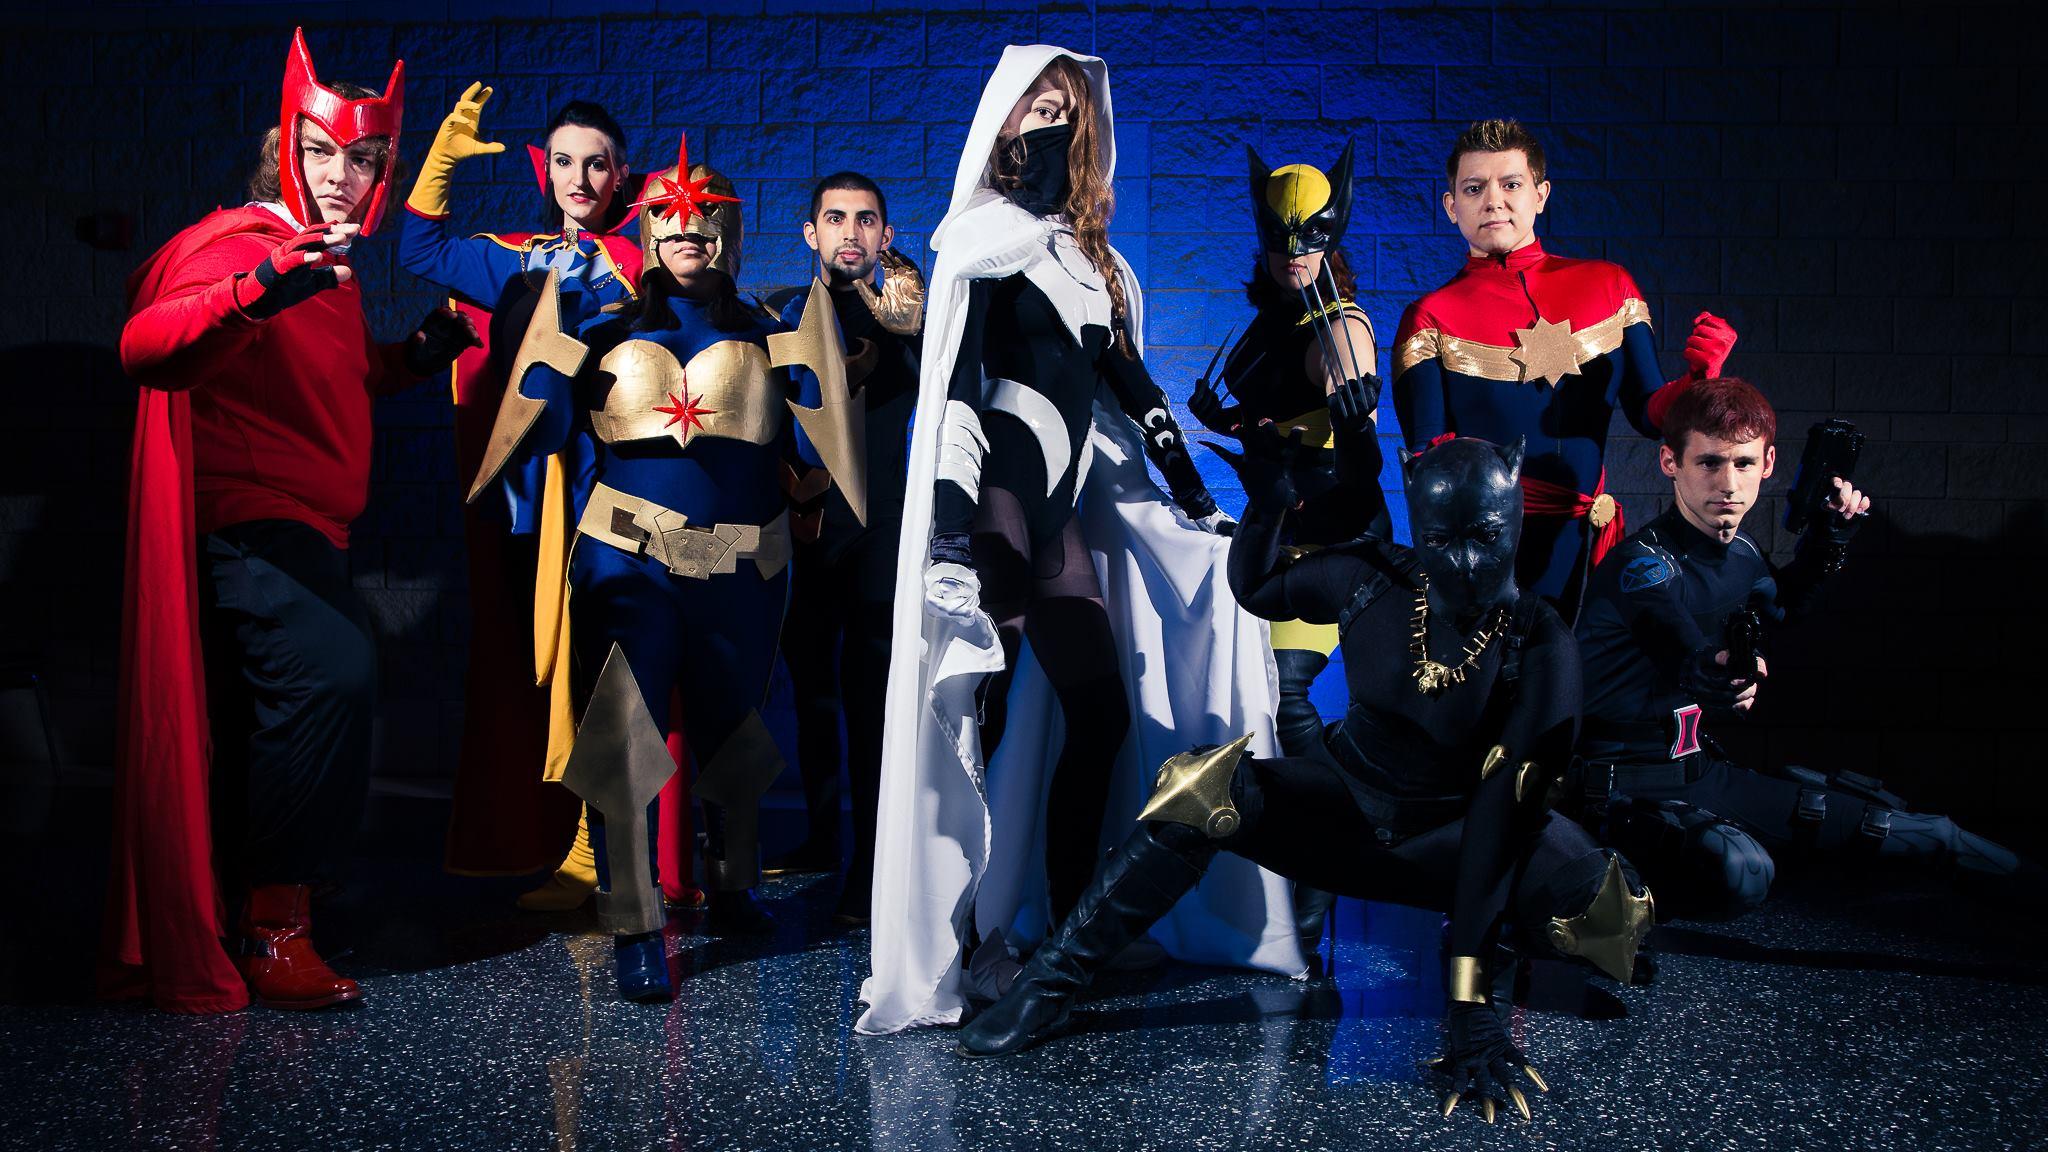 Genderbent Superhero Group